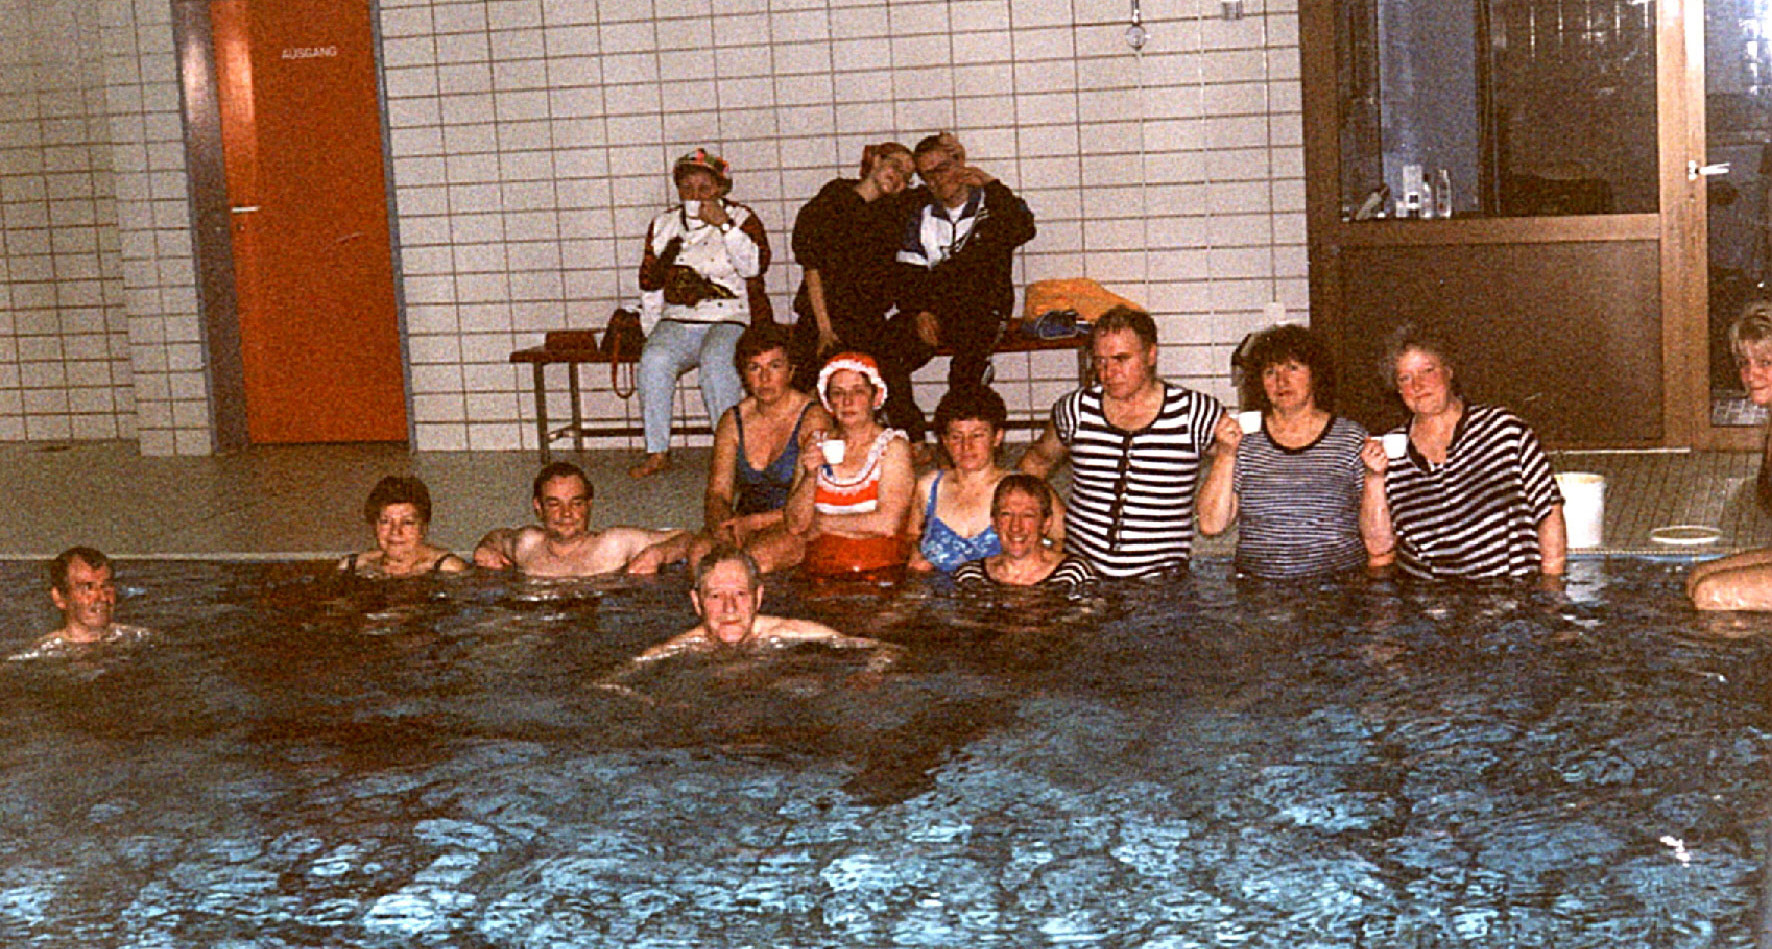 051-Deuselbach-1985-Rolf-Kube-(196).jpg